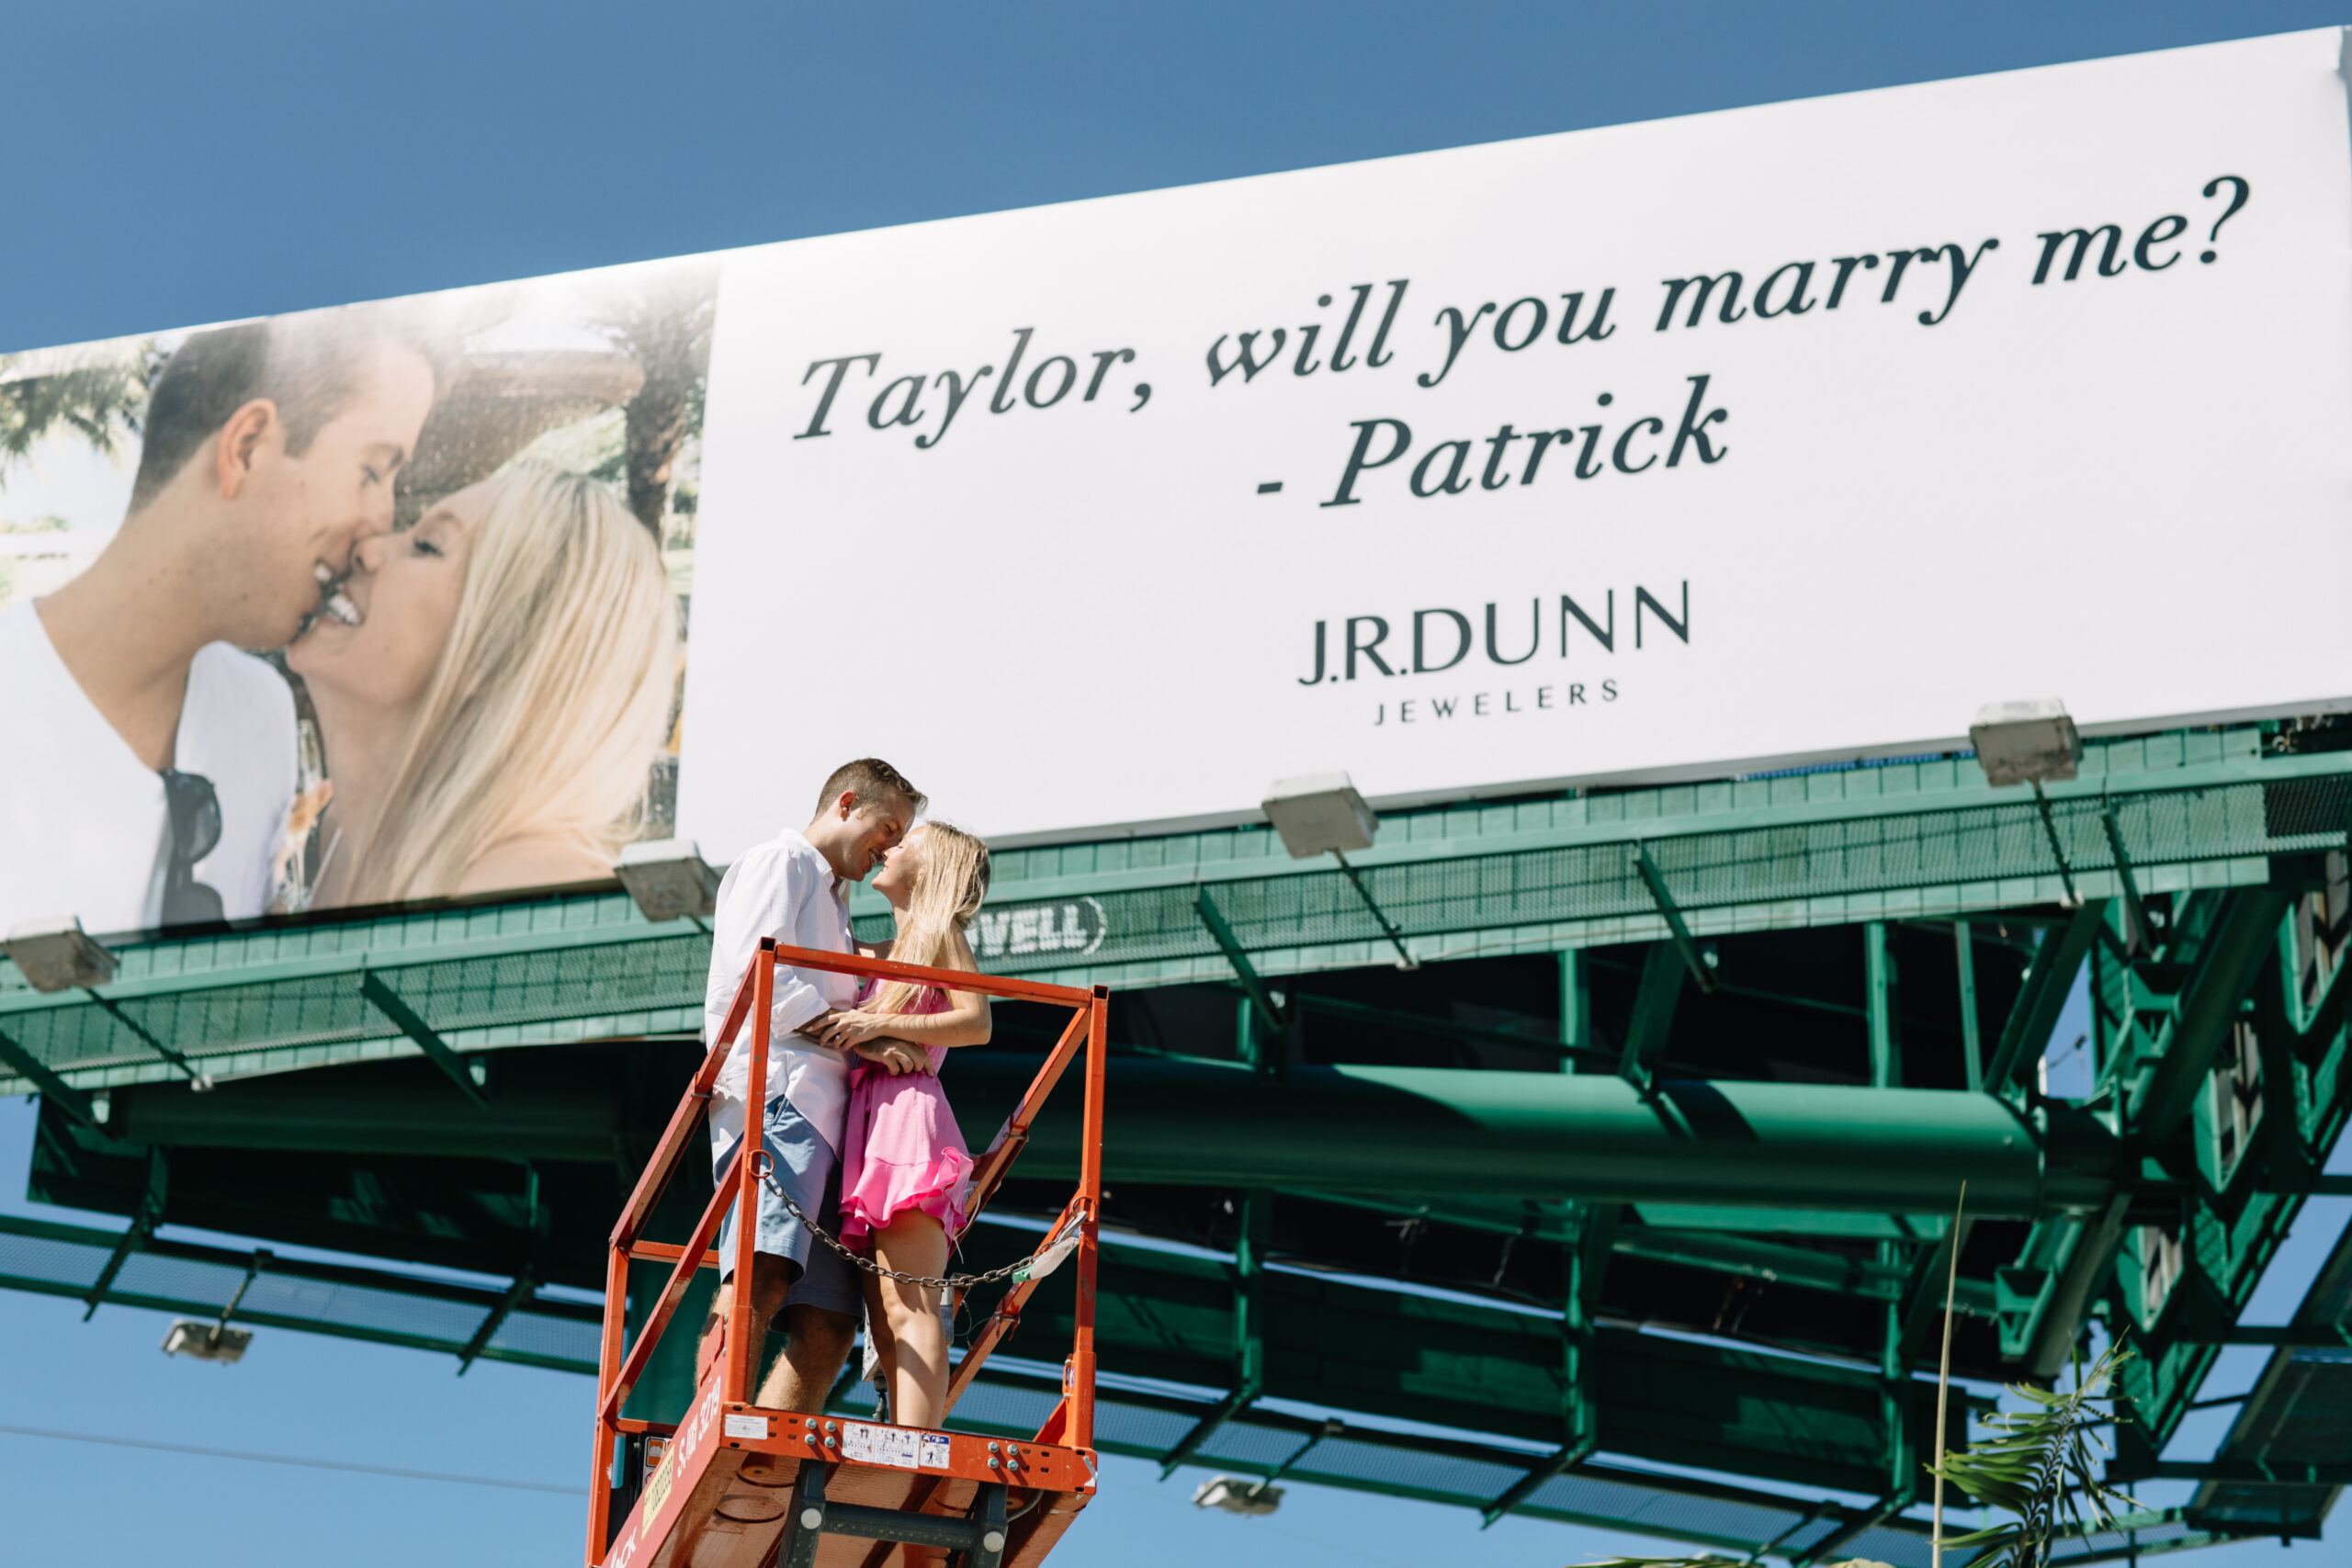 J.R. Dunn Jewelers regala una propuesta de matrimonio épica mediante una valla publicitaria